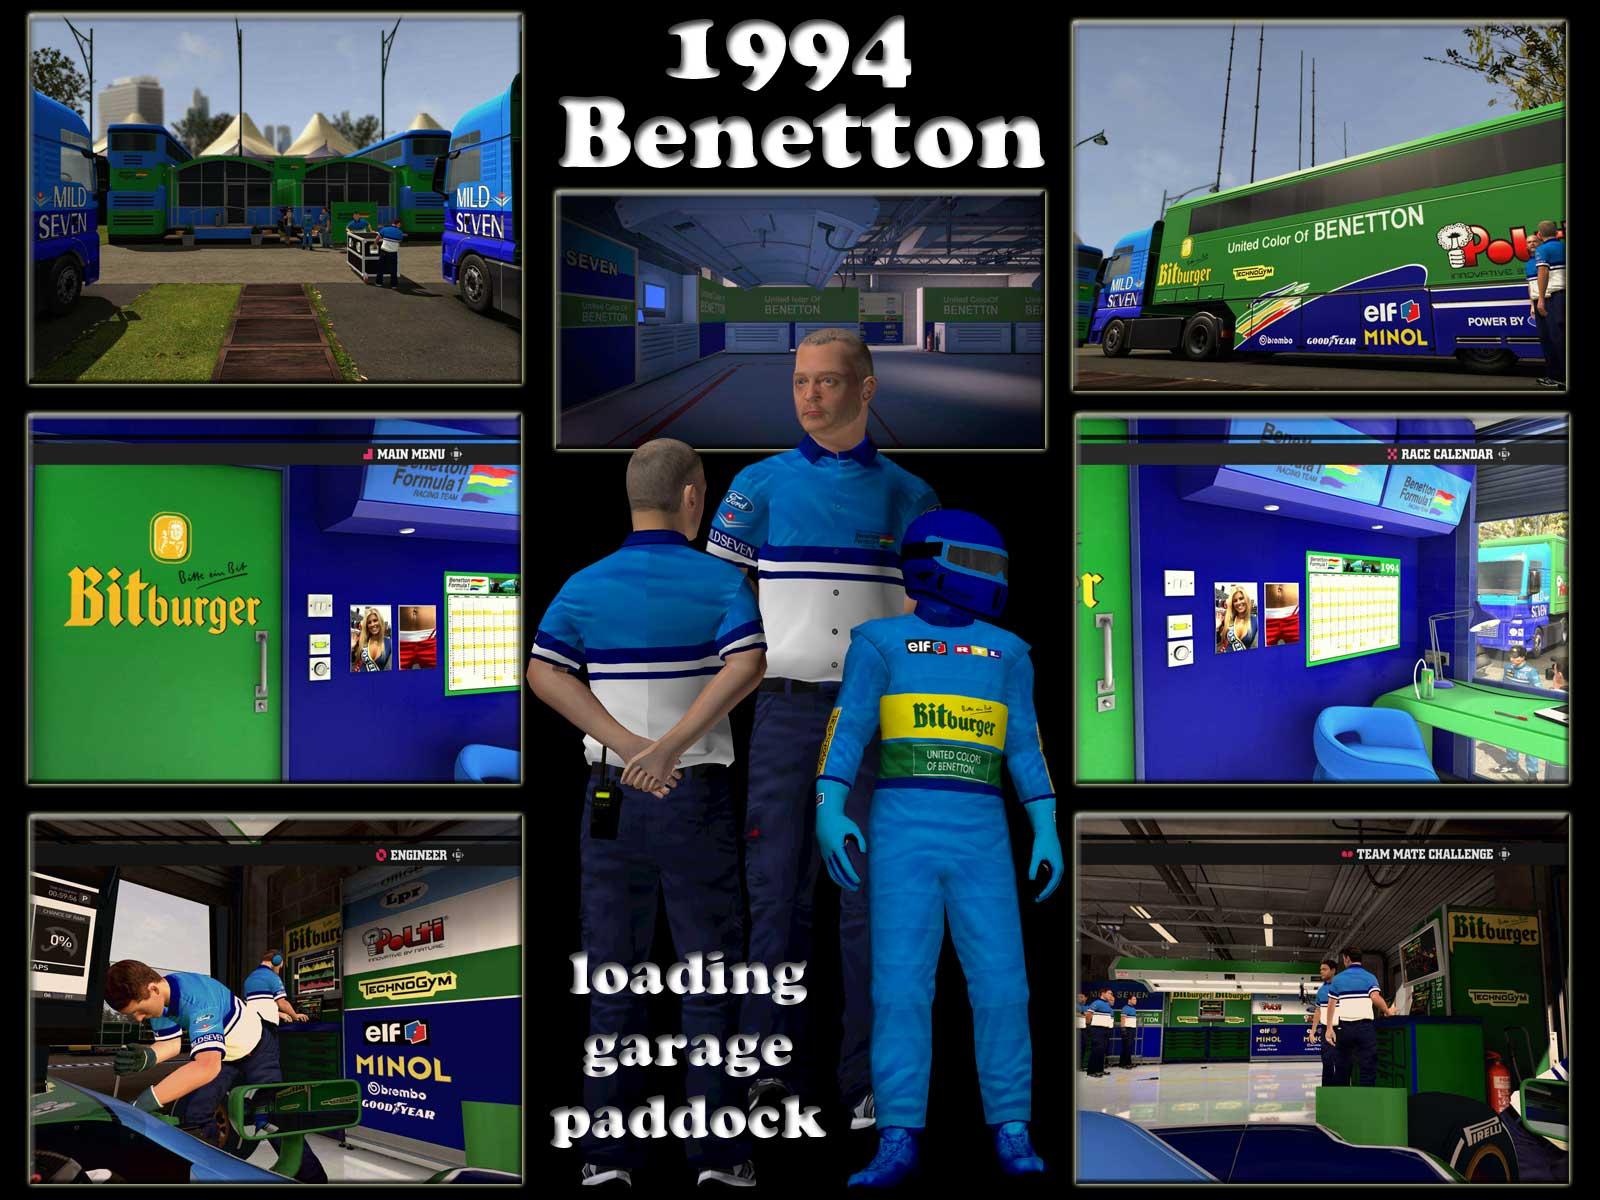 94-Benetton-Info.jpg